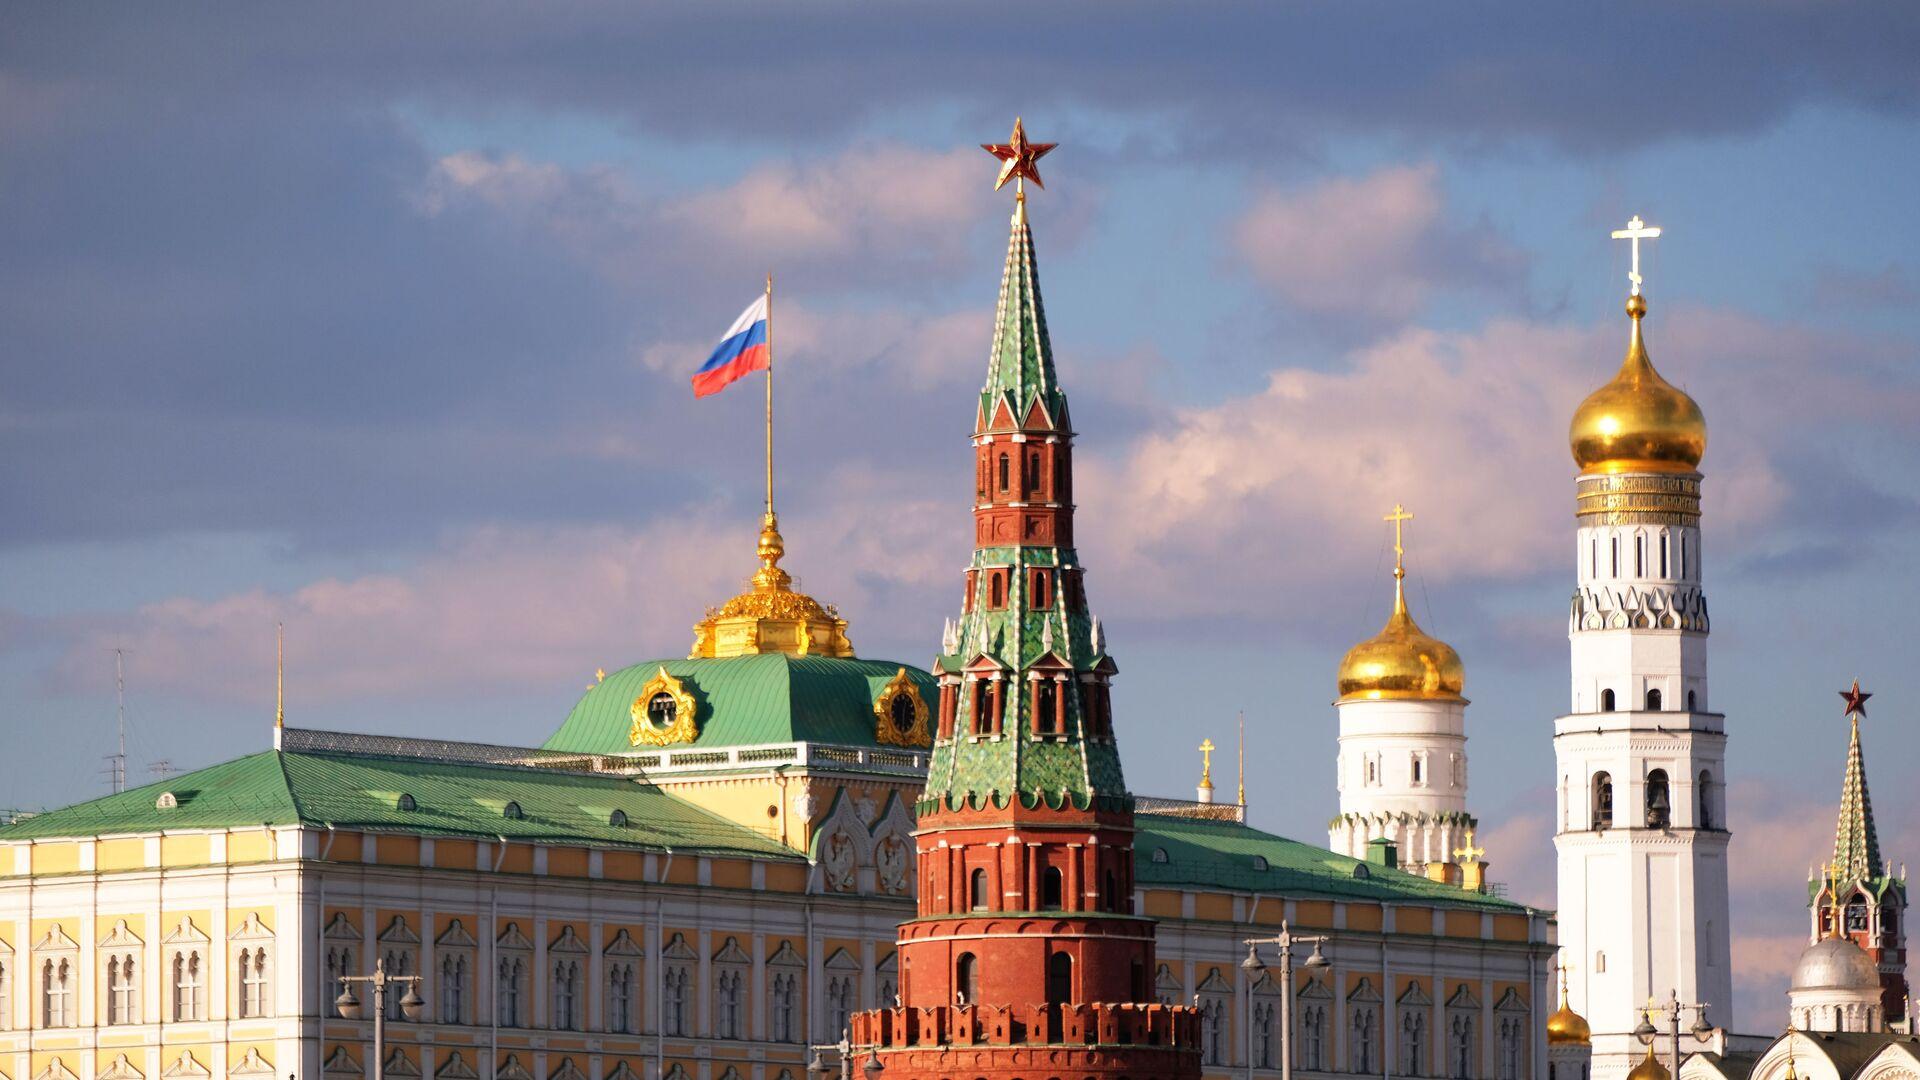 El Kremlin de Moscú - Sputnik Mundo, 1920, 11.03.2021